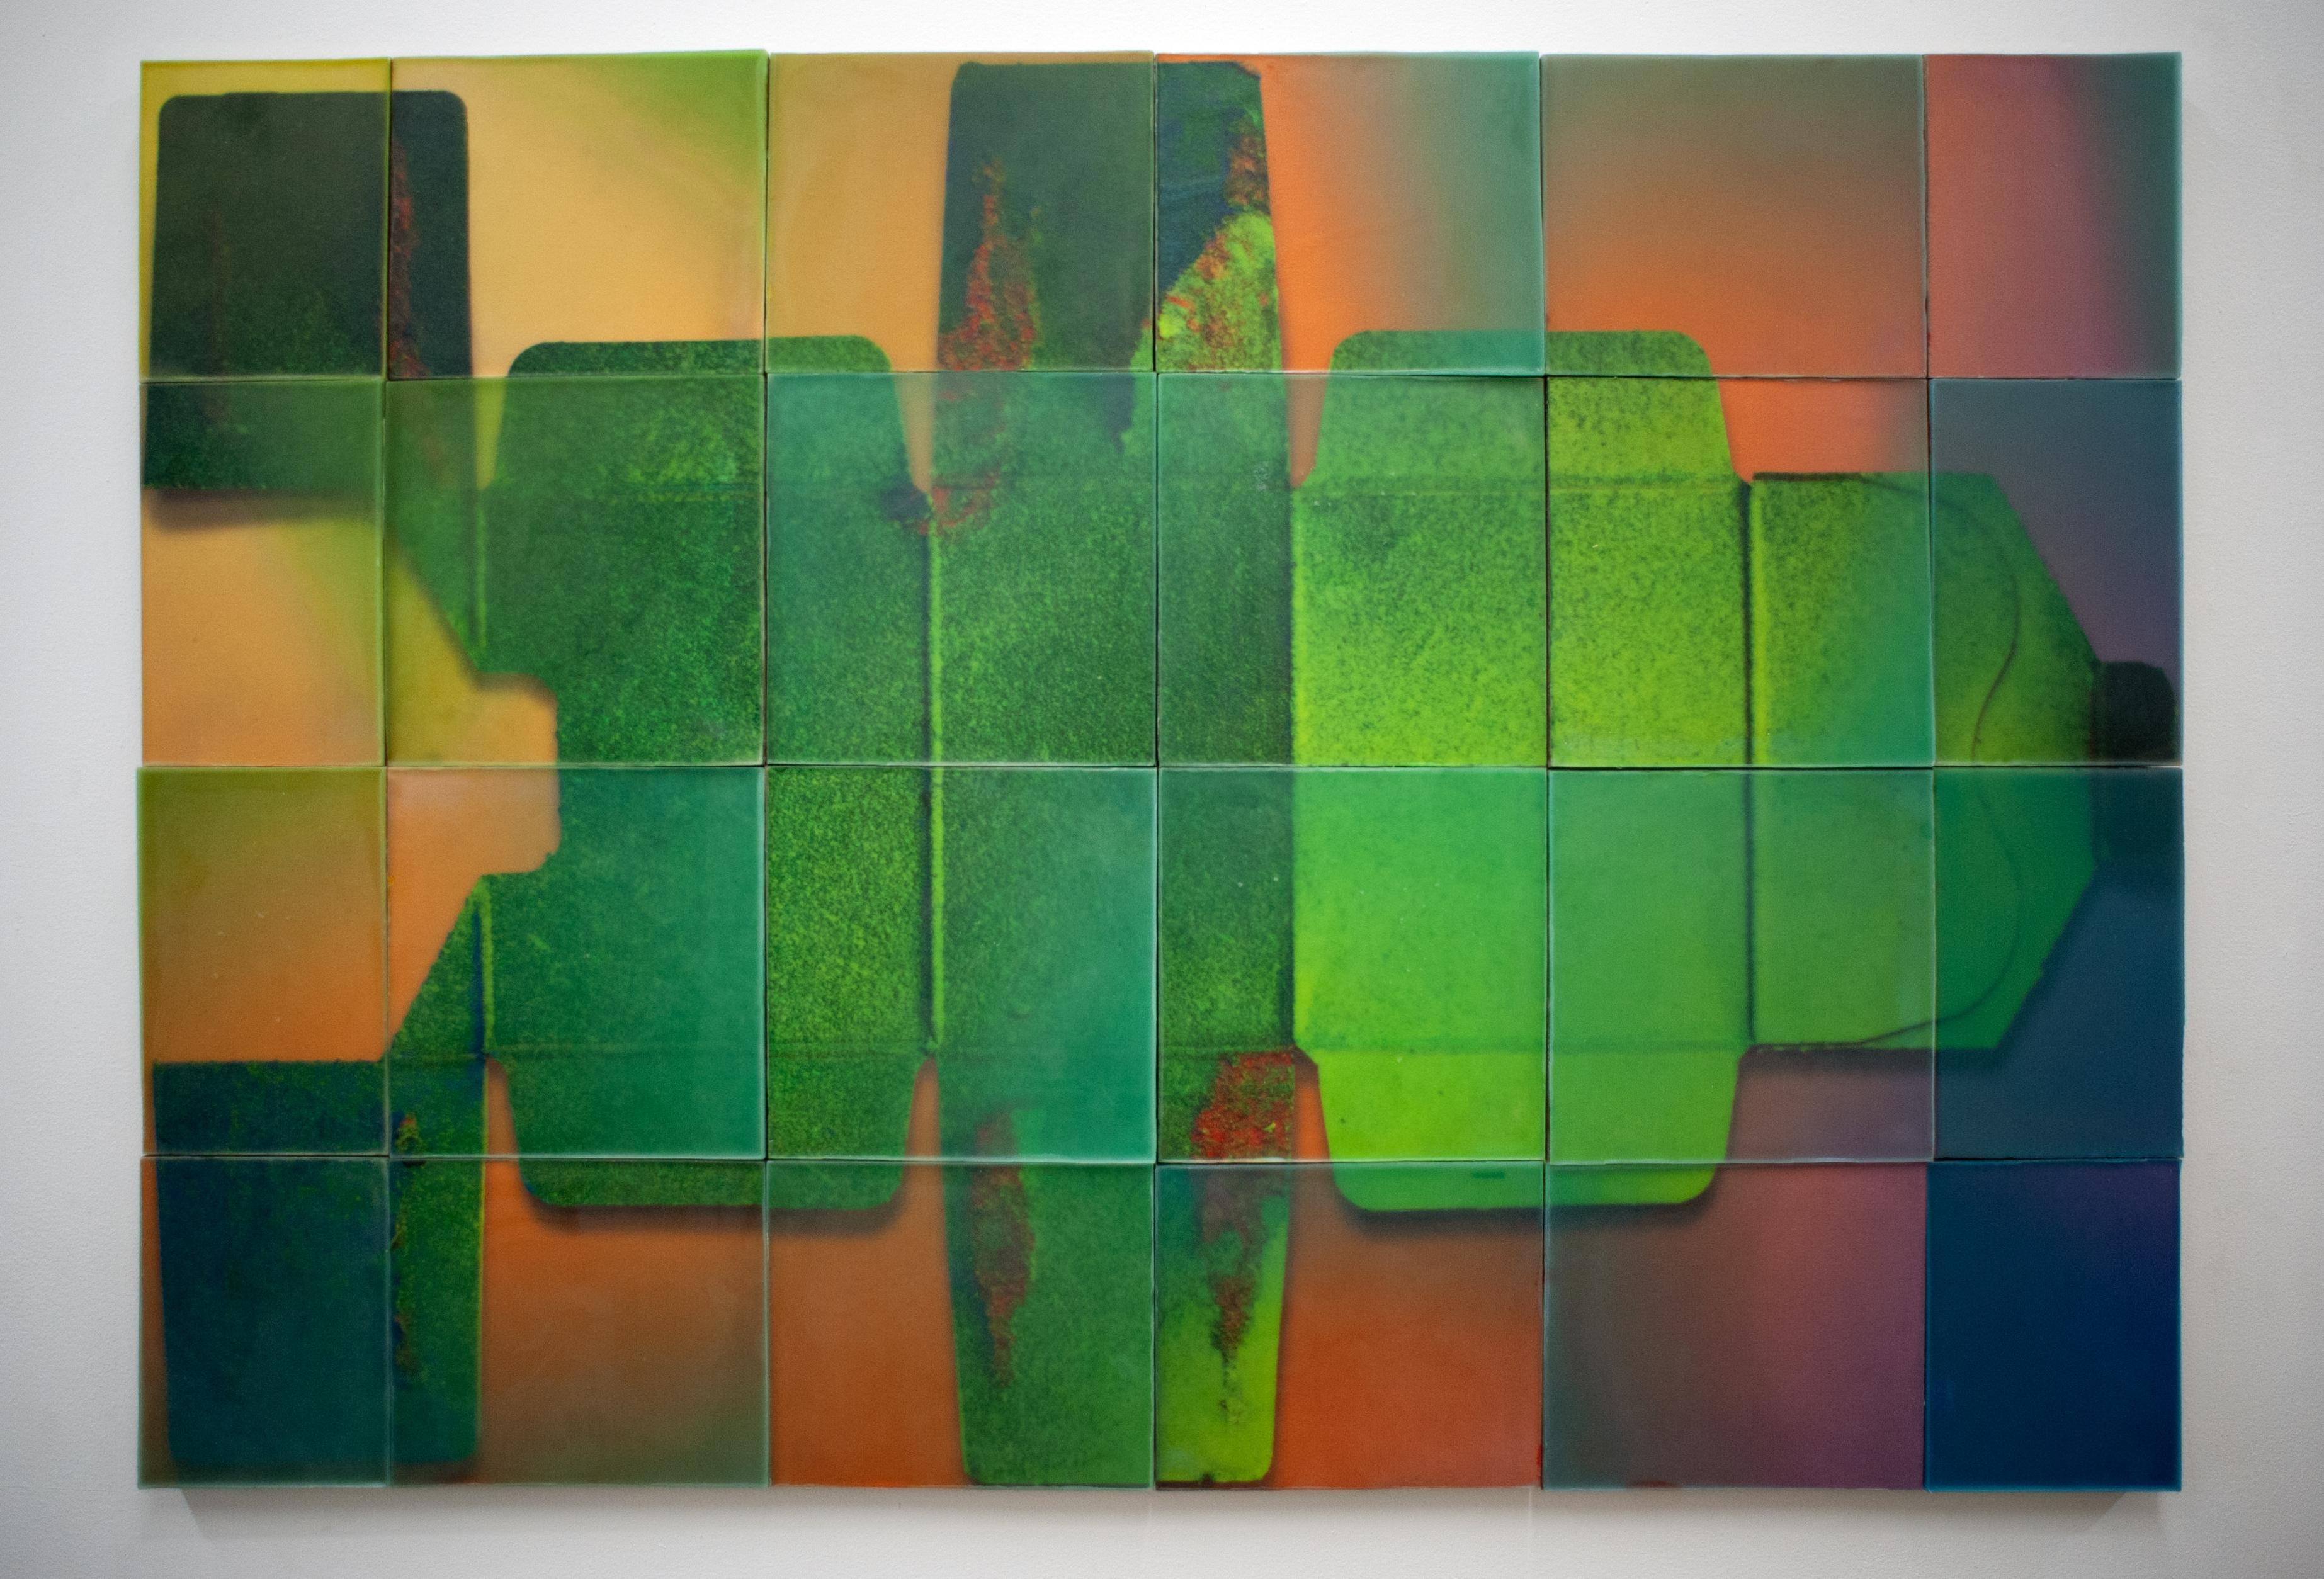 """Botox"", waxwork multi-panel wall installation, Geometric Abstract Installation"